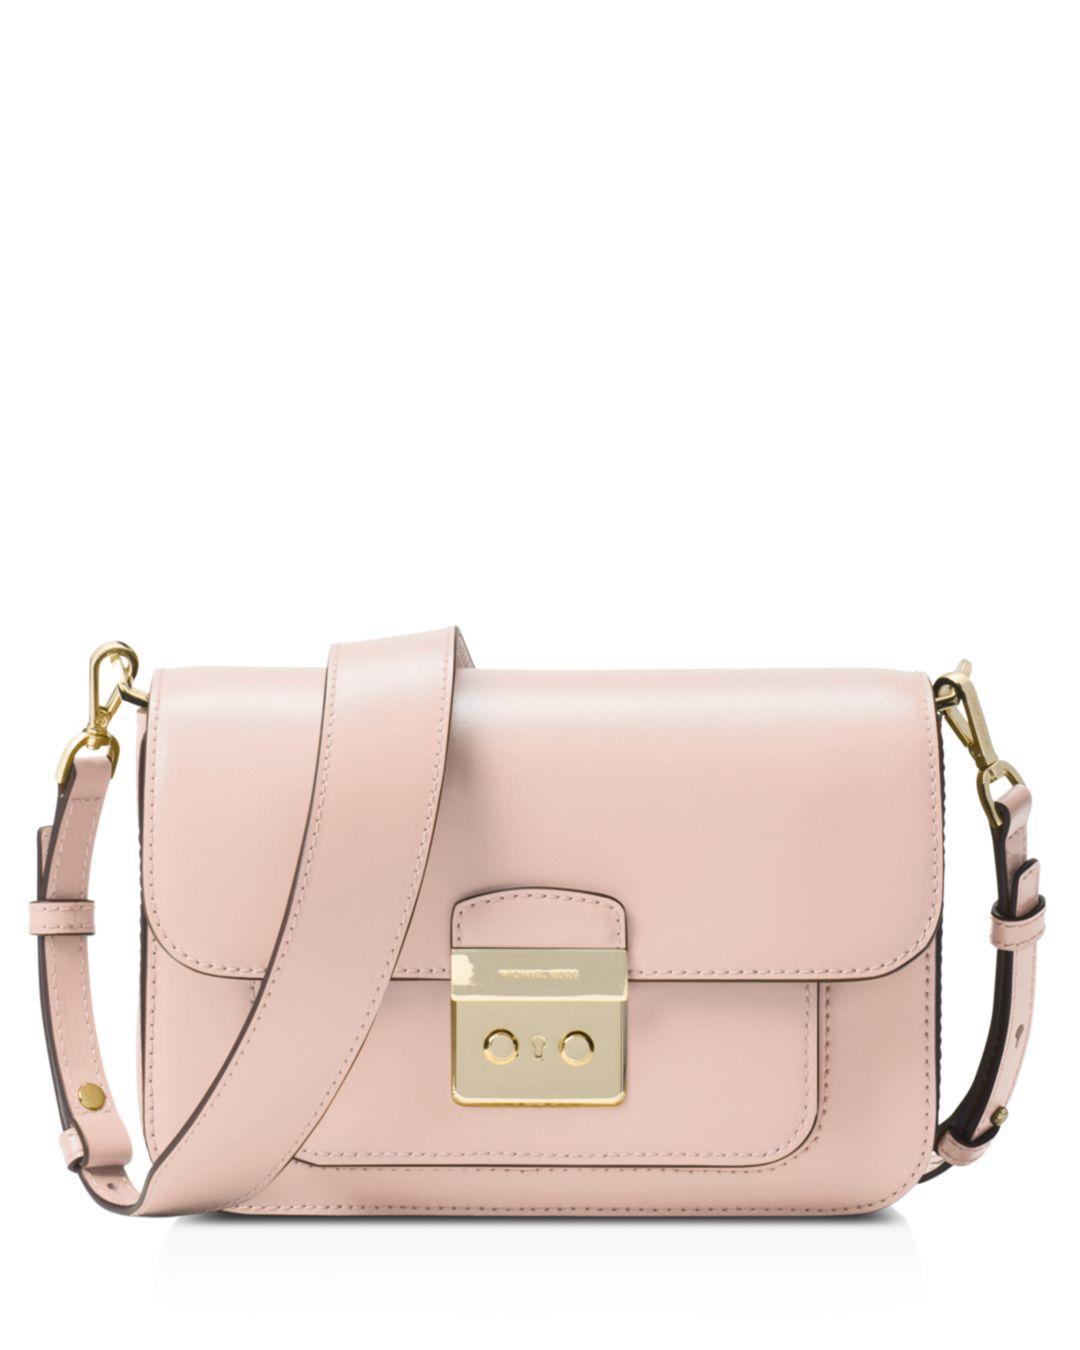 21b68ad4c7c7 MICHAEL Michael Kors Sloan Editor Large Leather Shoulder Bag in Pink ...